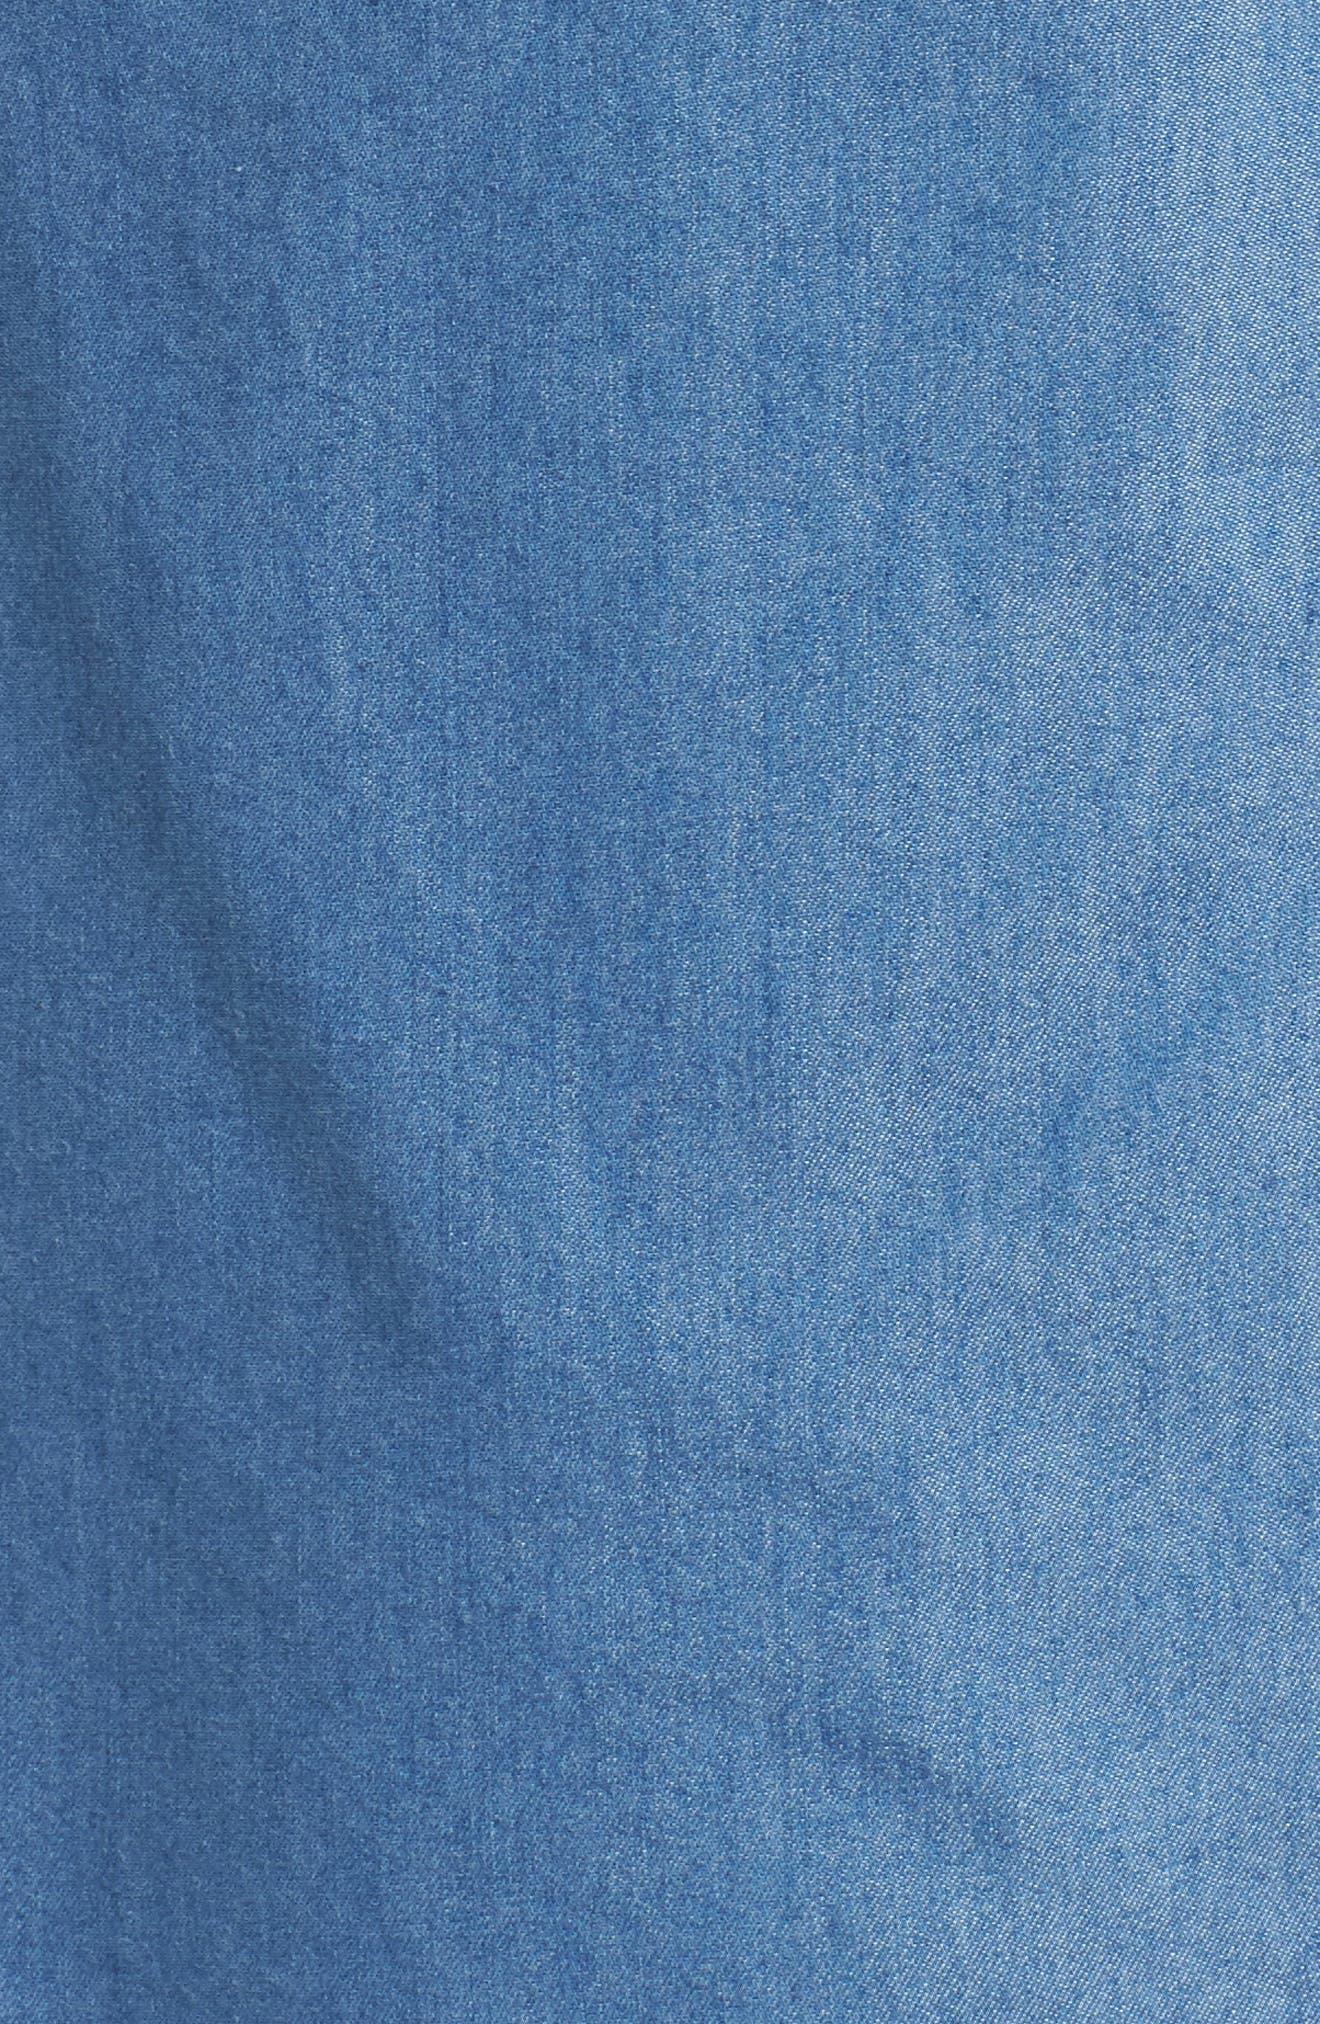 MICHAEL MICHAEL KORS,                             Dog Tag Chambray Shirt,                             Alternate thumbnail 5, color,                             LIGHT CADET WASH